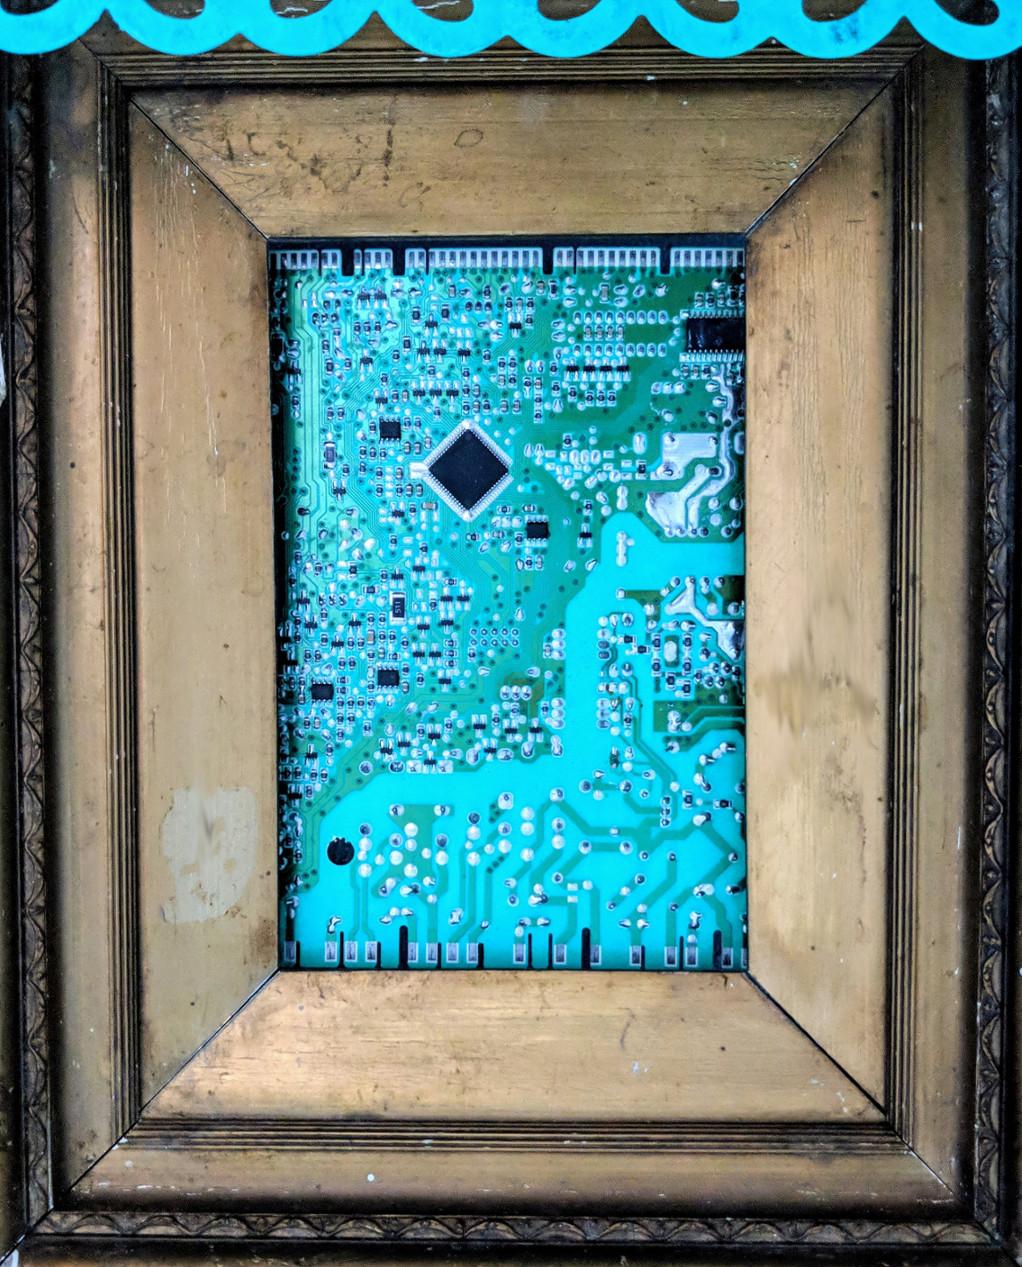 113 circuit board art villa ama sicily.jpg